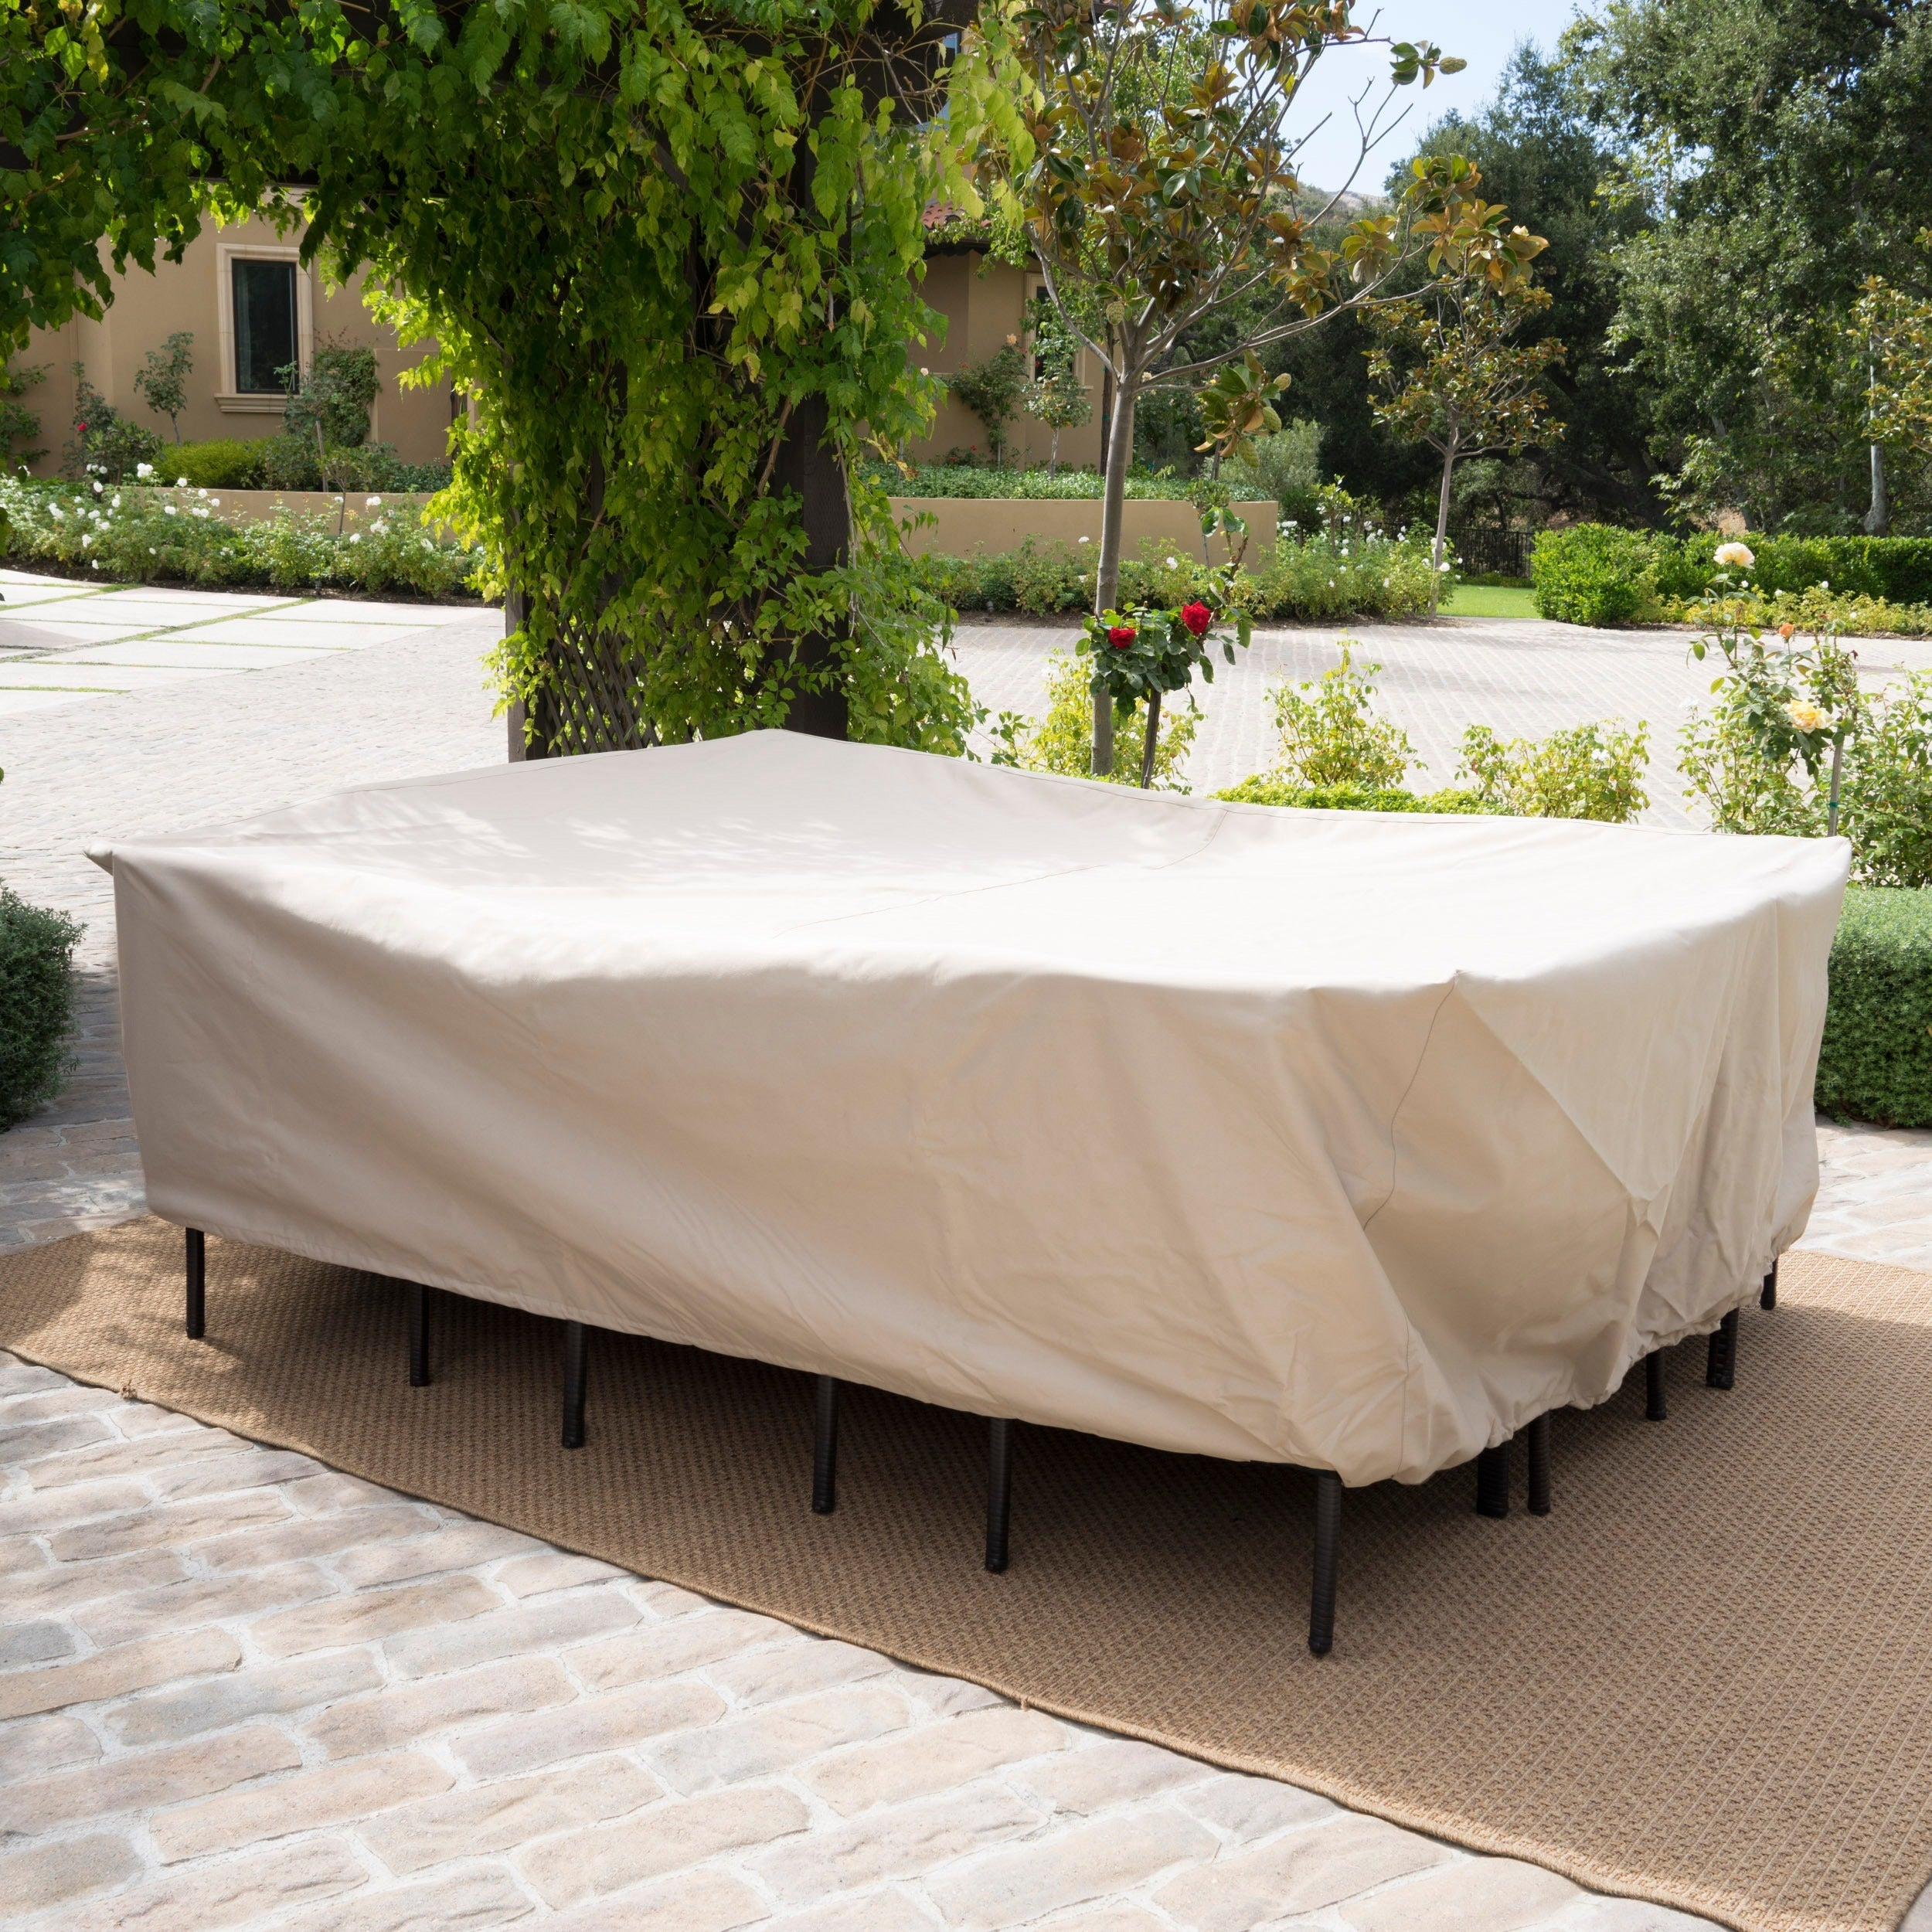 Waterproof Umbrella Sets Home Garden Furniture Storage Bag Pvc Material Patio Outdoor Car Umbrella Cover Large Size Interior Accessories